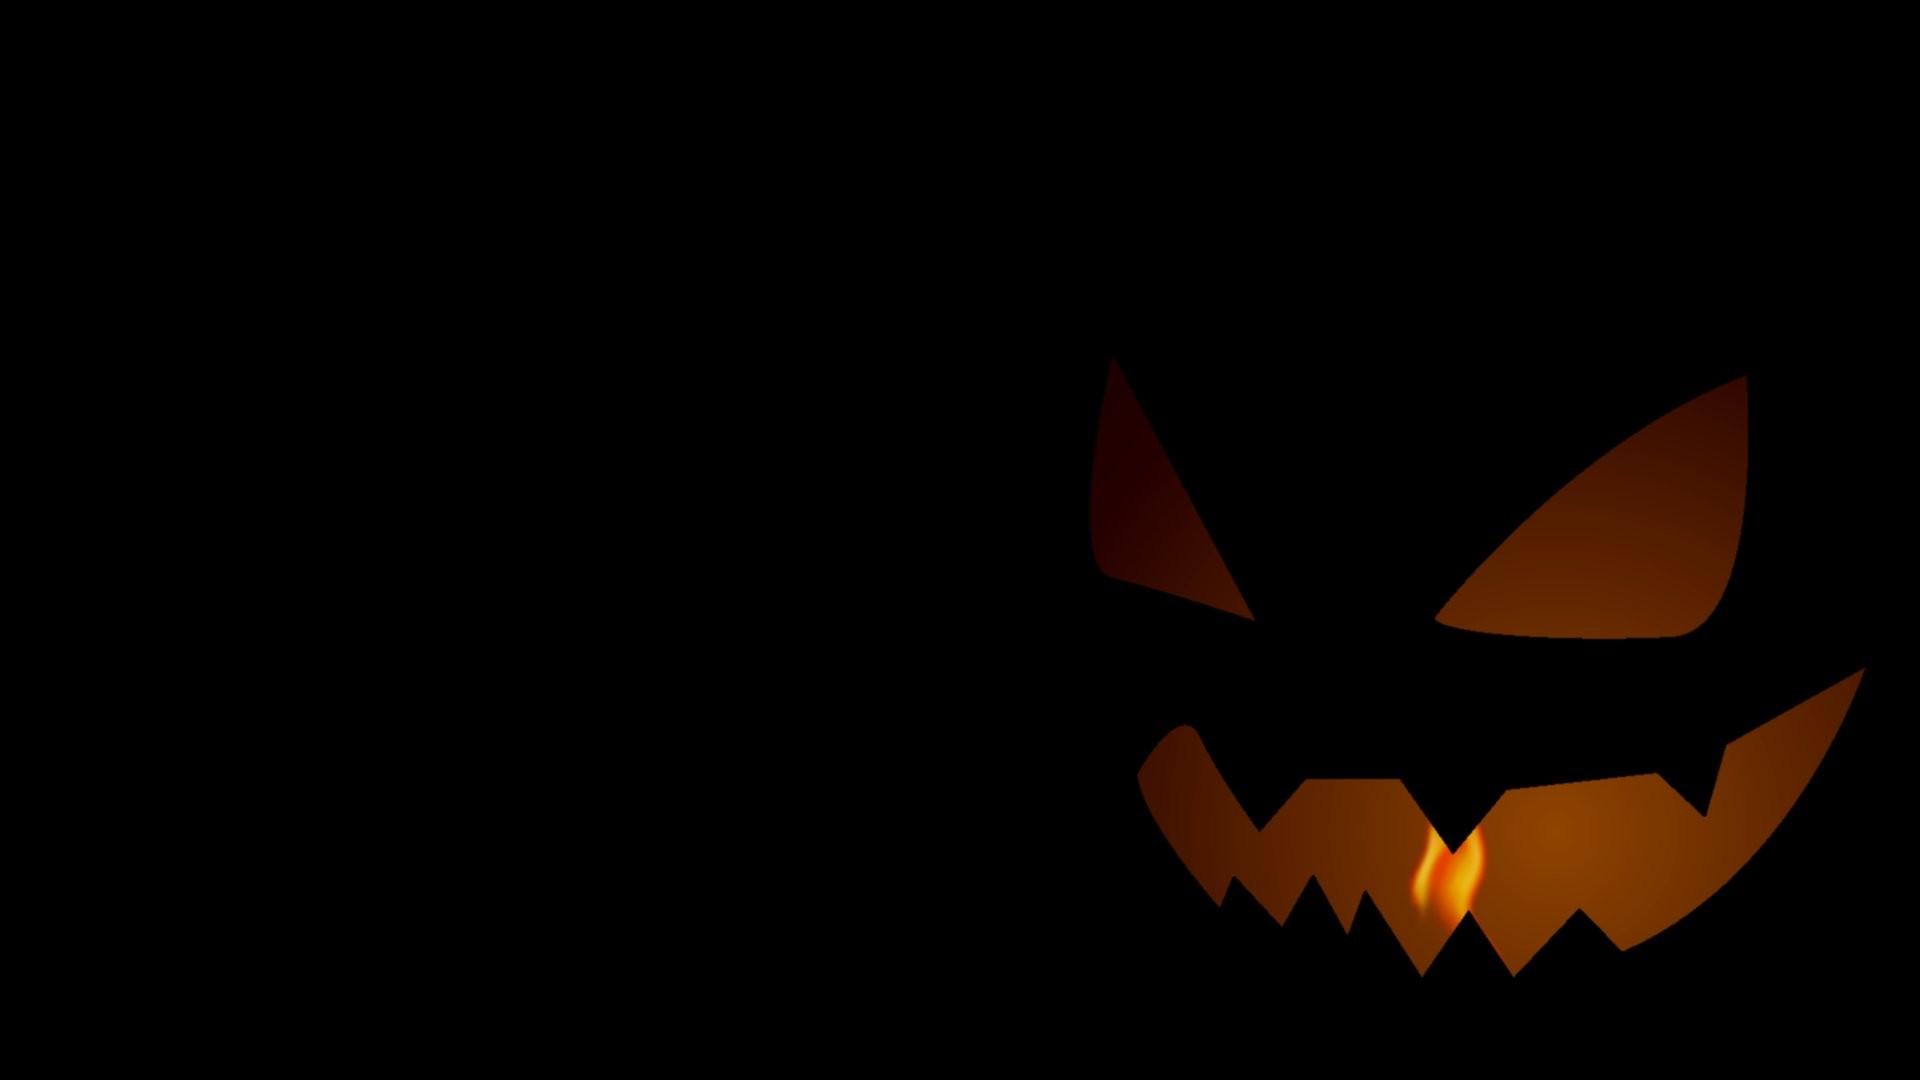 Happy Halloween HD Wallpapers Educational Entertainment 1600×1200 Animated Halloween  Wallpapers (35 Wallpapers)